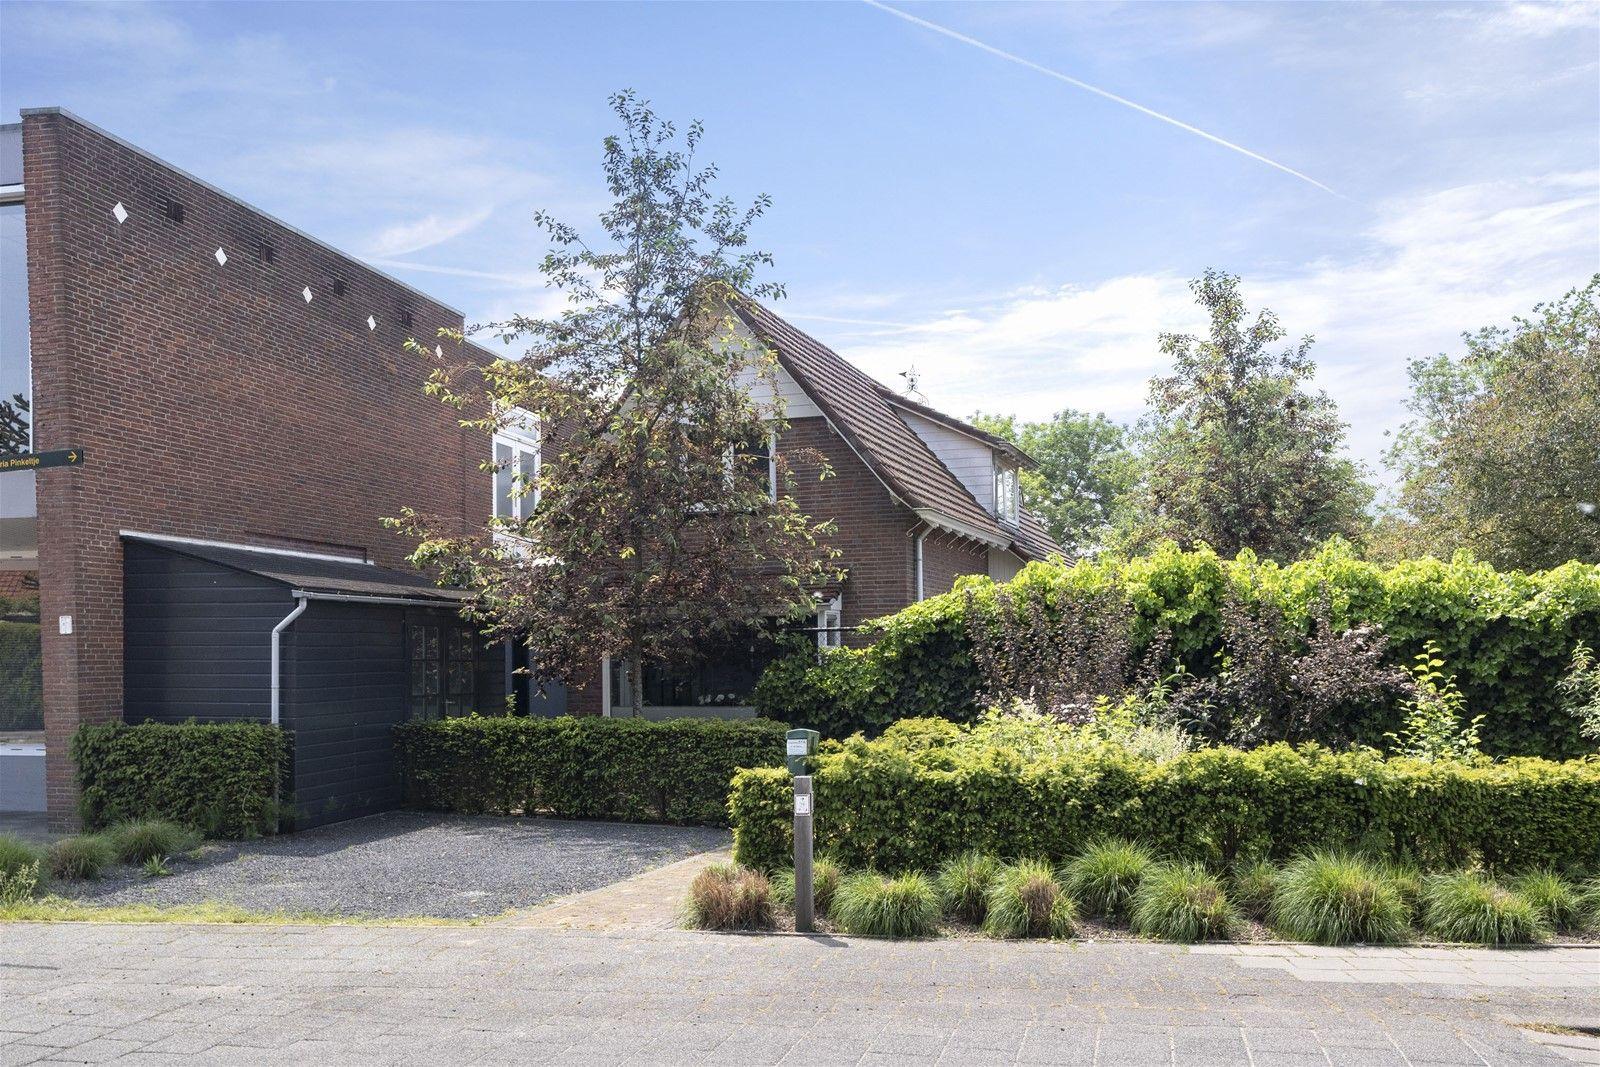 Dorpsstraat 51a, Rijswijk (nb)